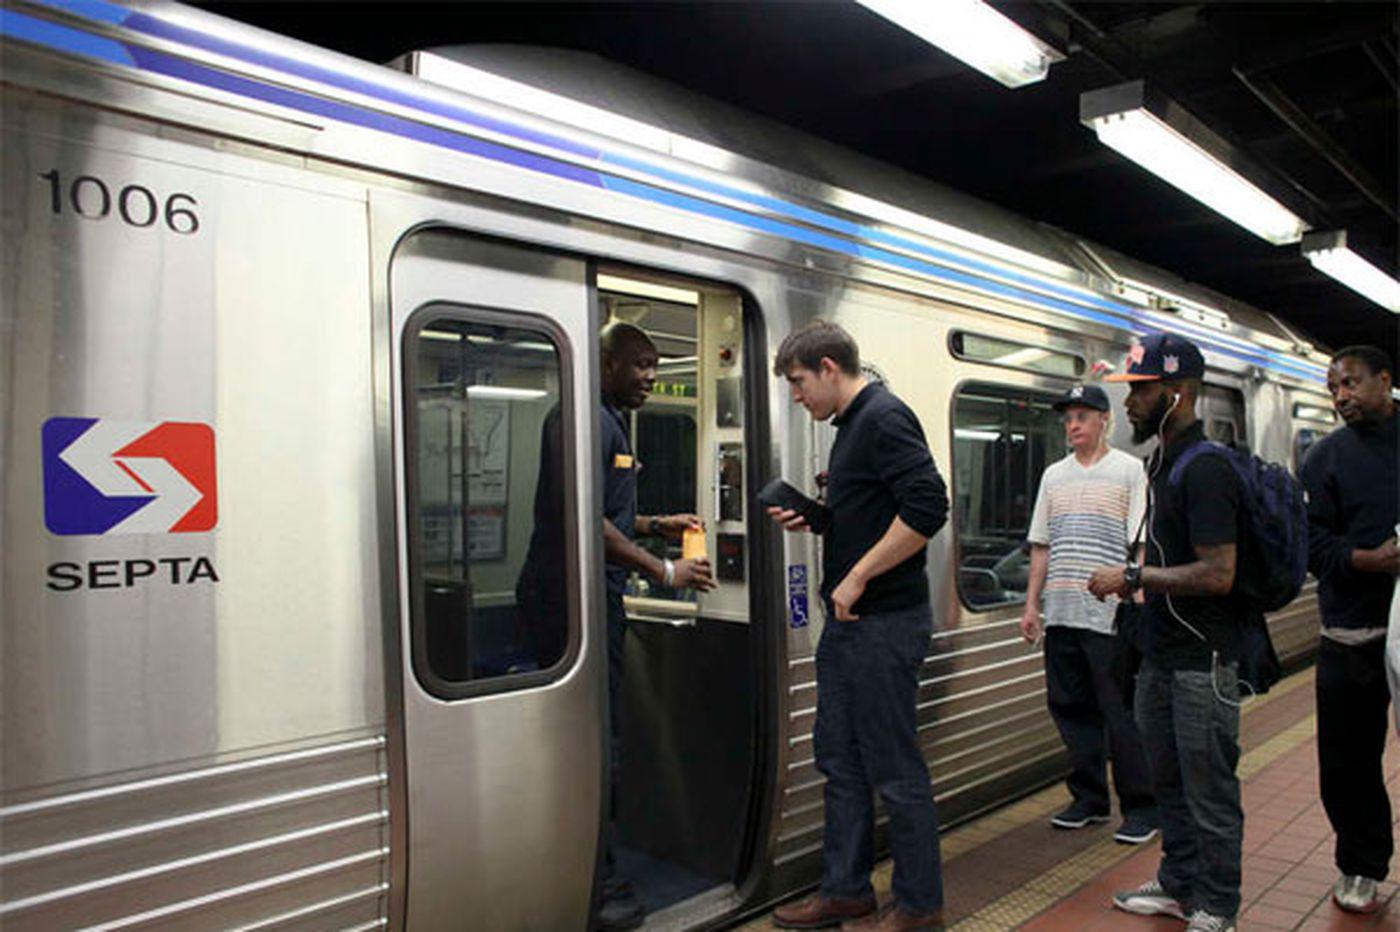 Night owls drawn to 24-hour SEPTA subway service